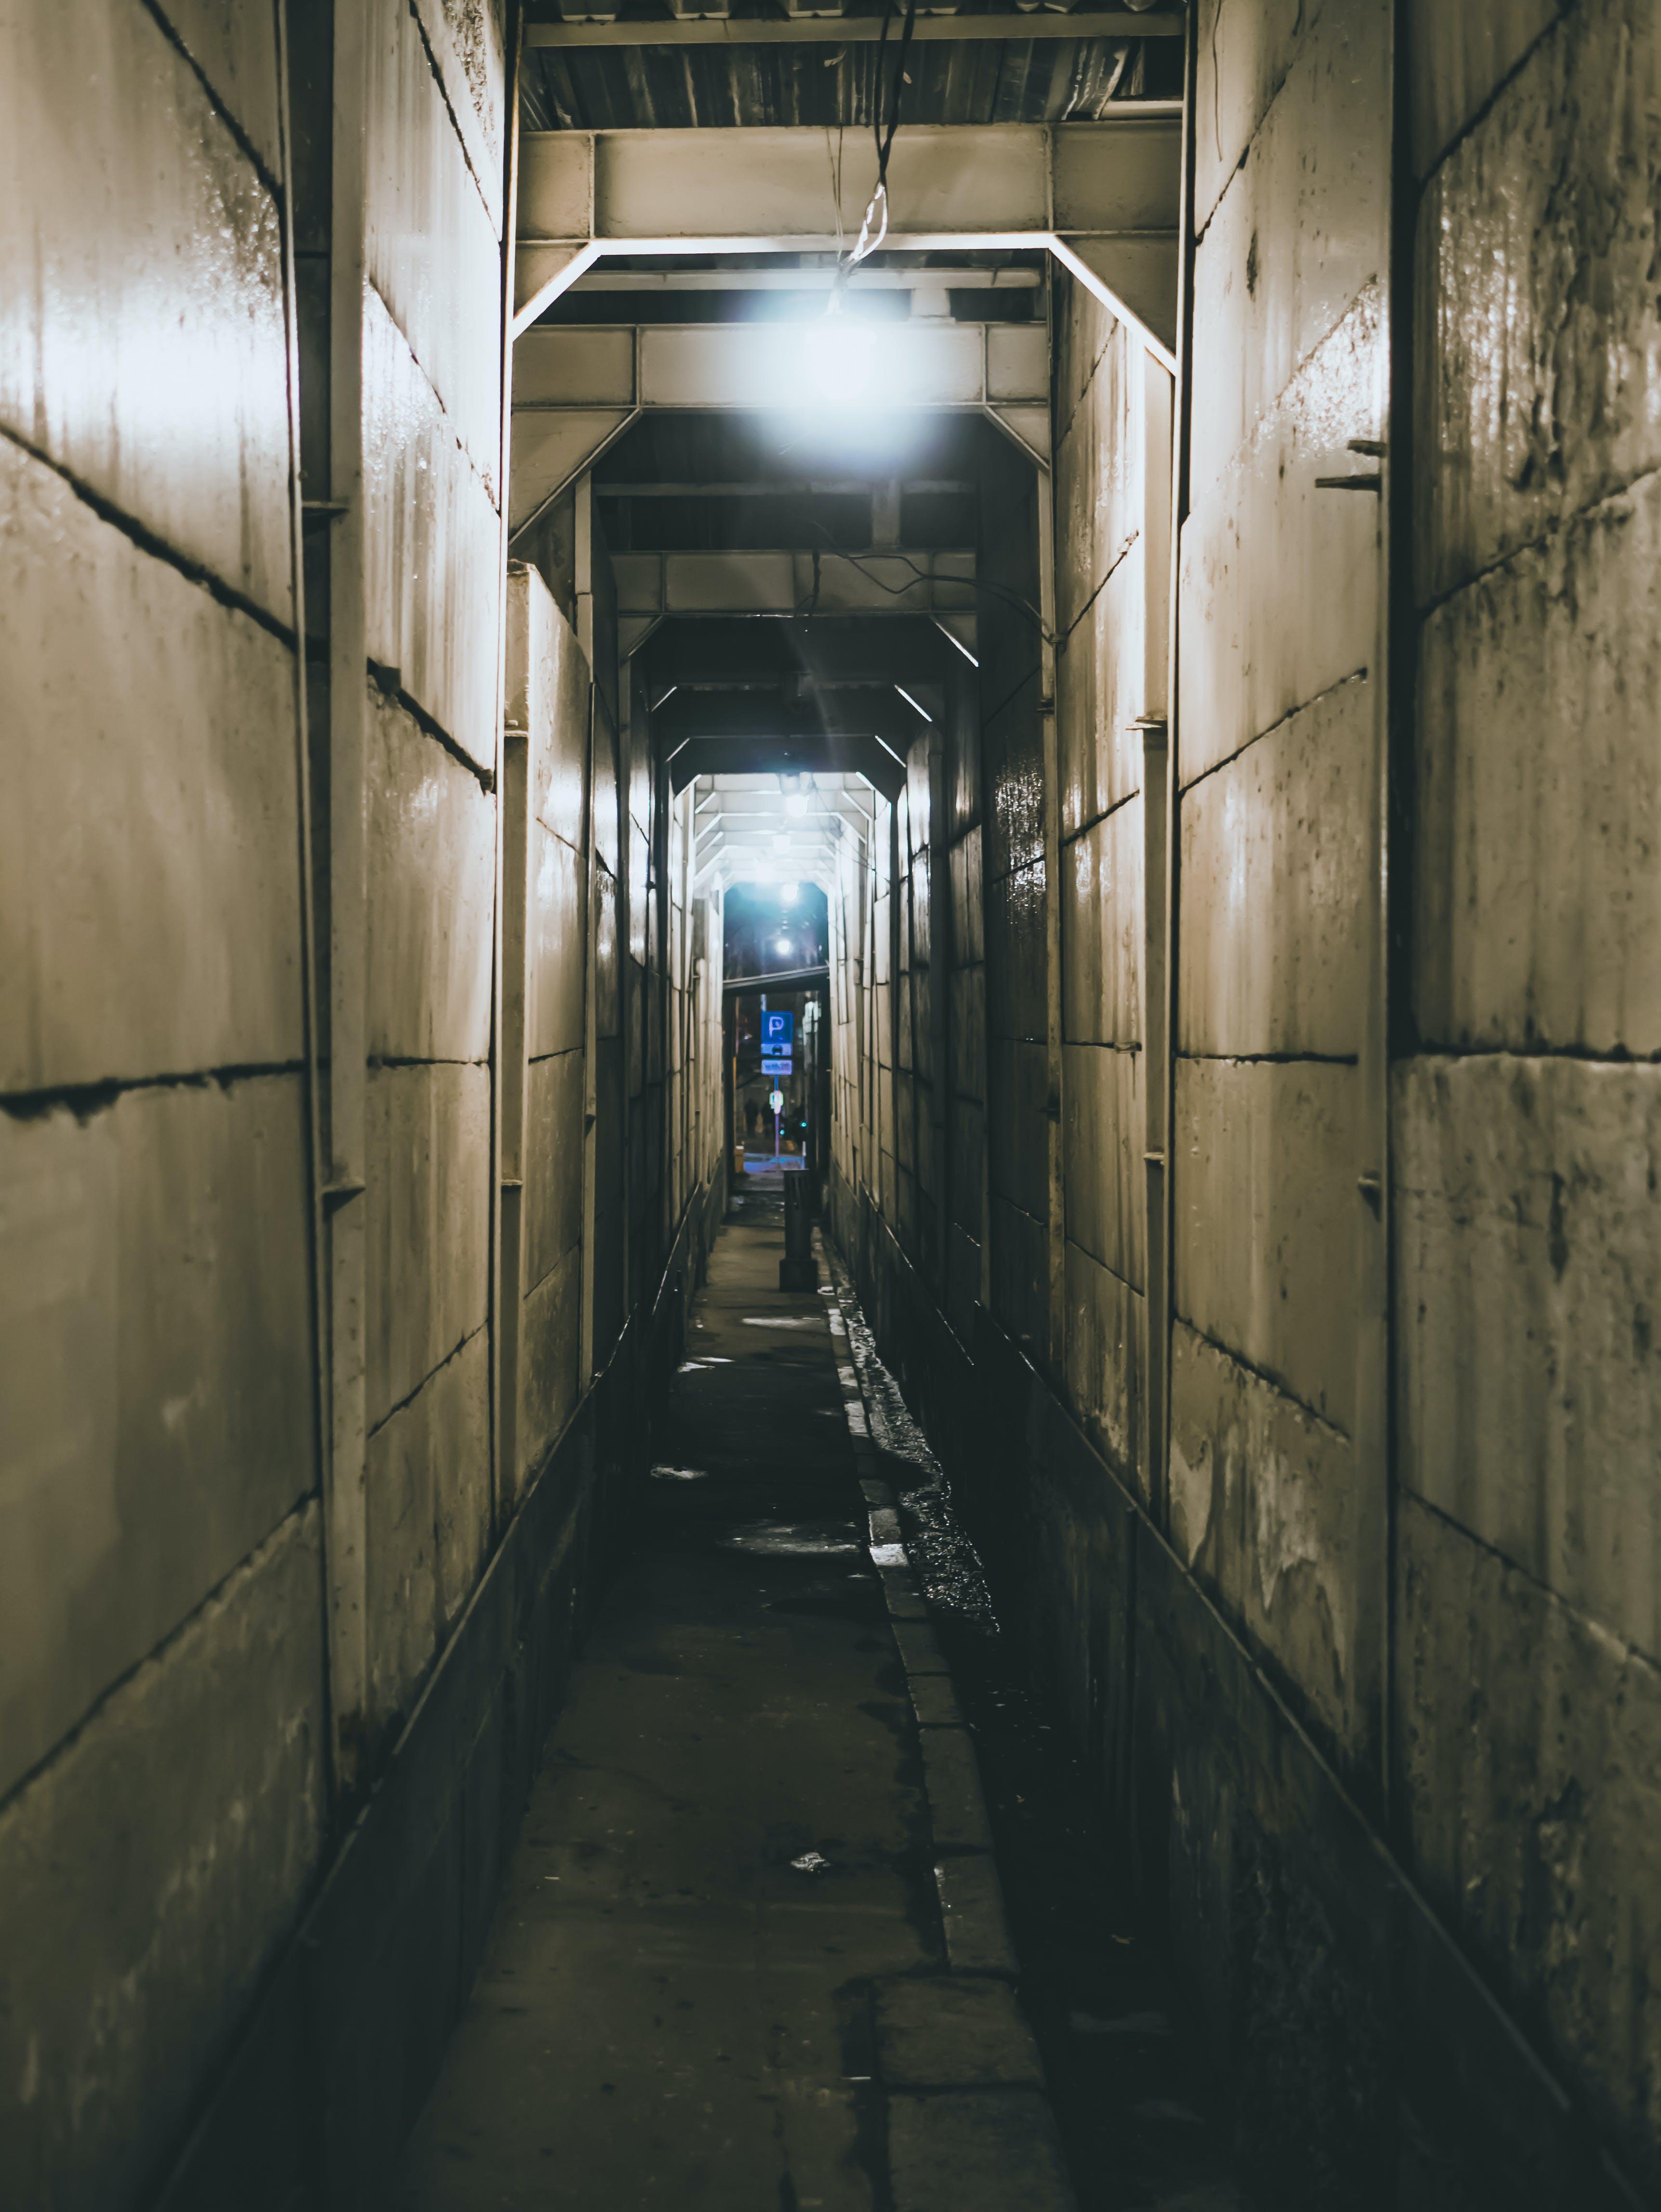 Narrow Corridor With White Light Bulb on Top